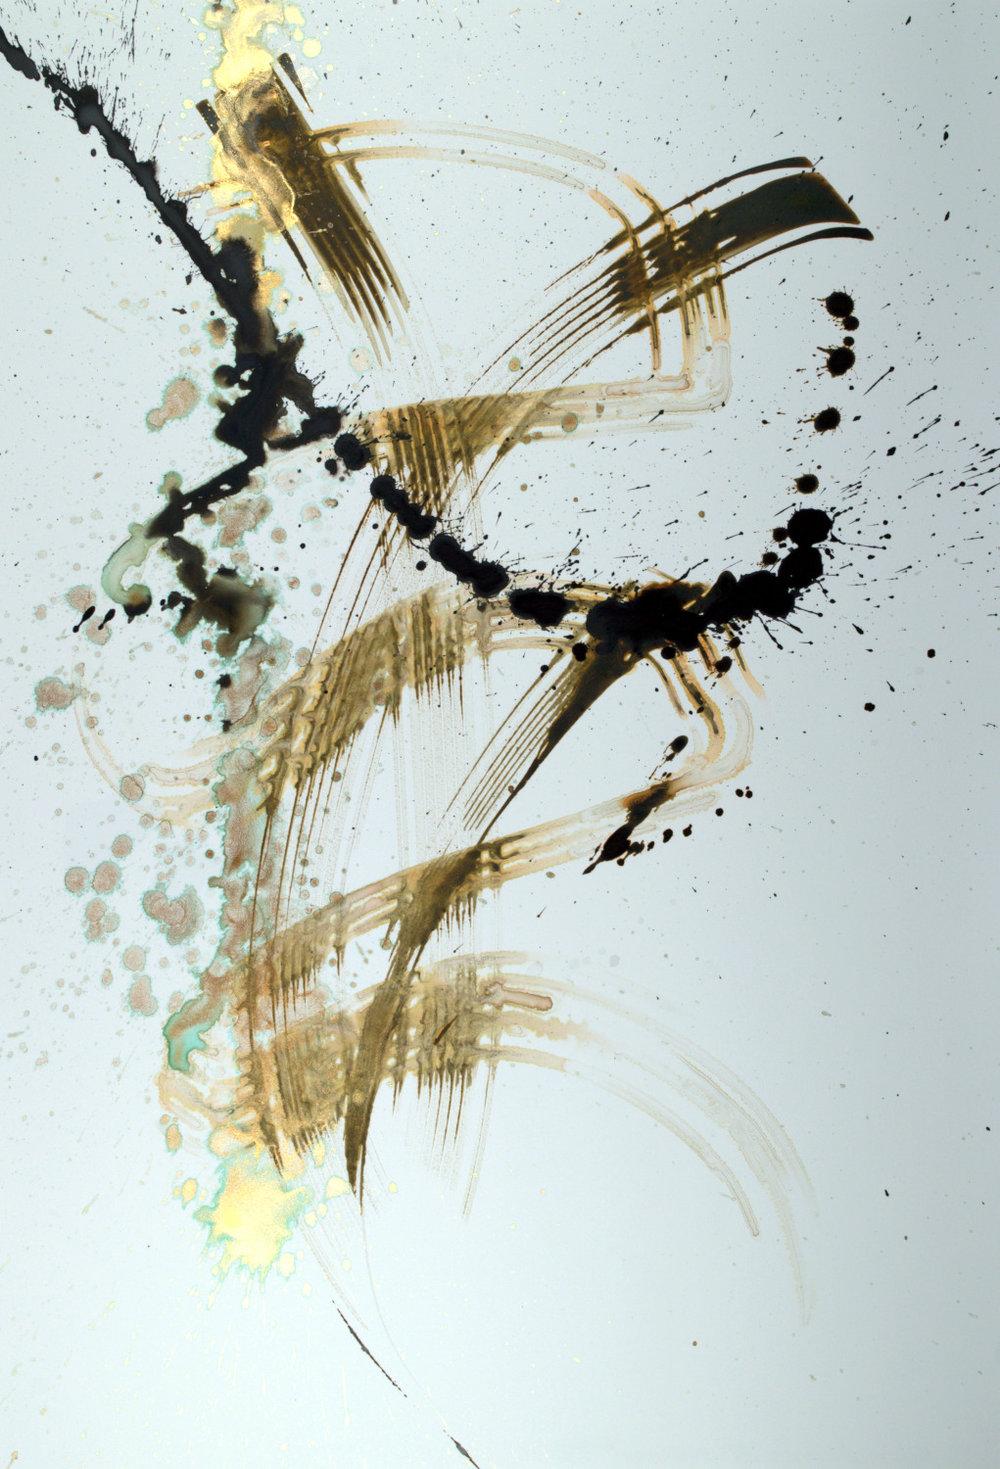 Symphonic Movement IV - 13x9 - available